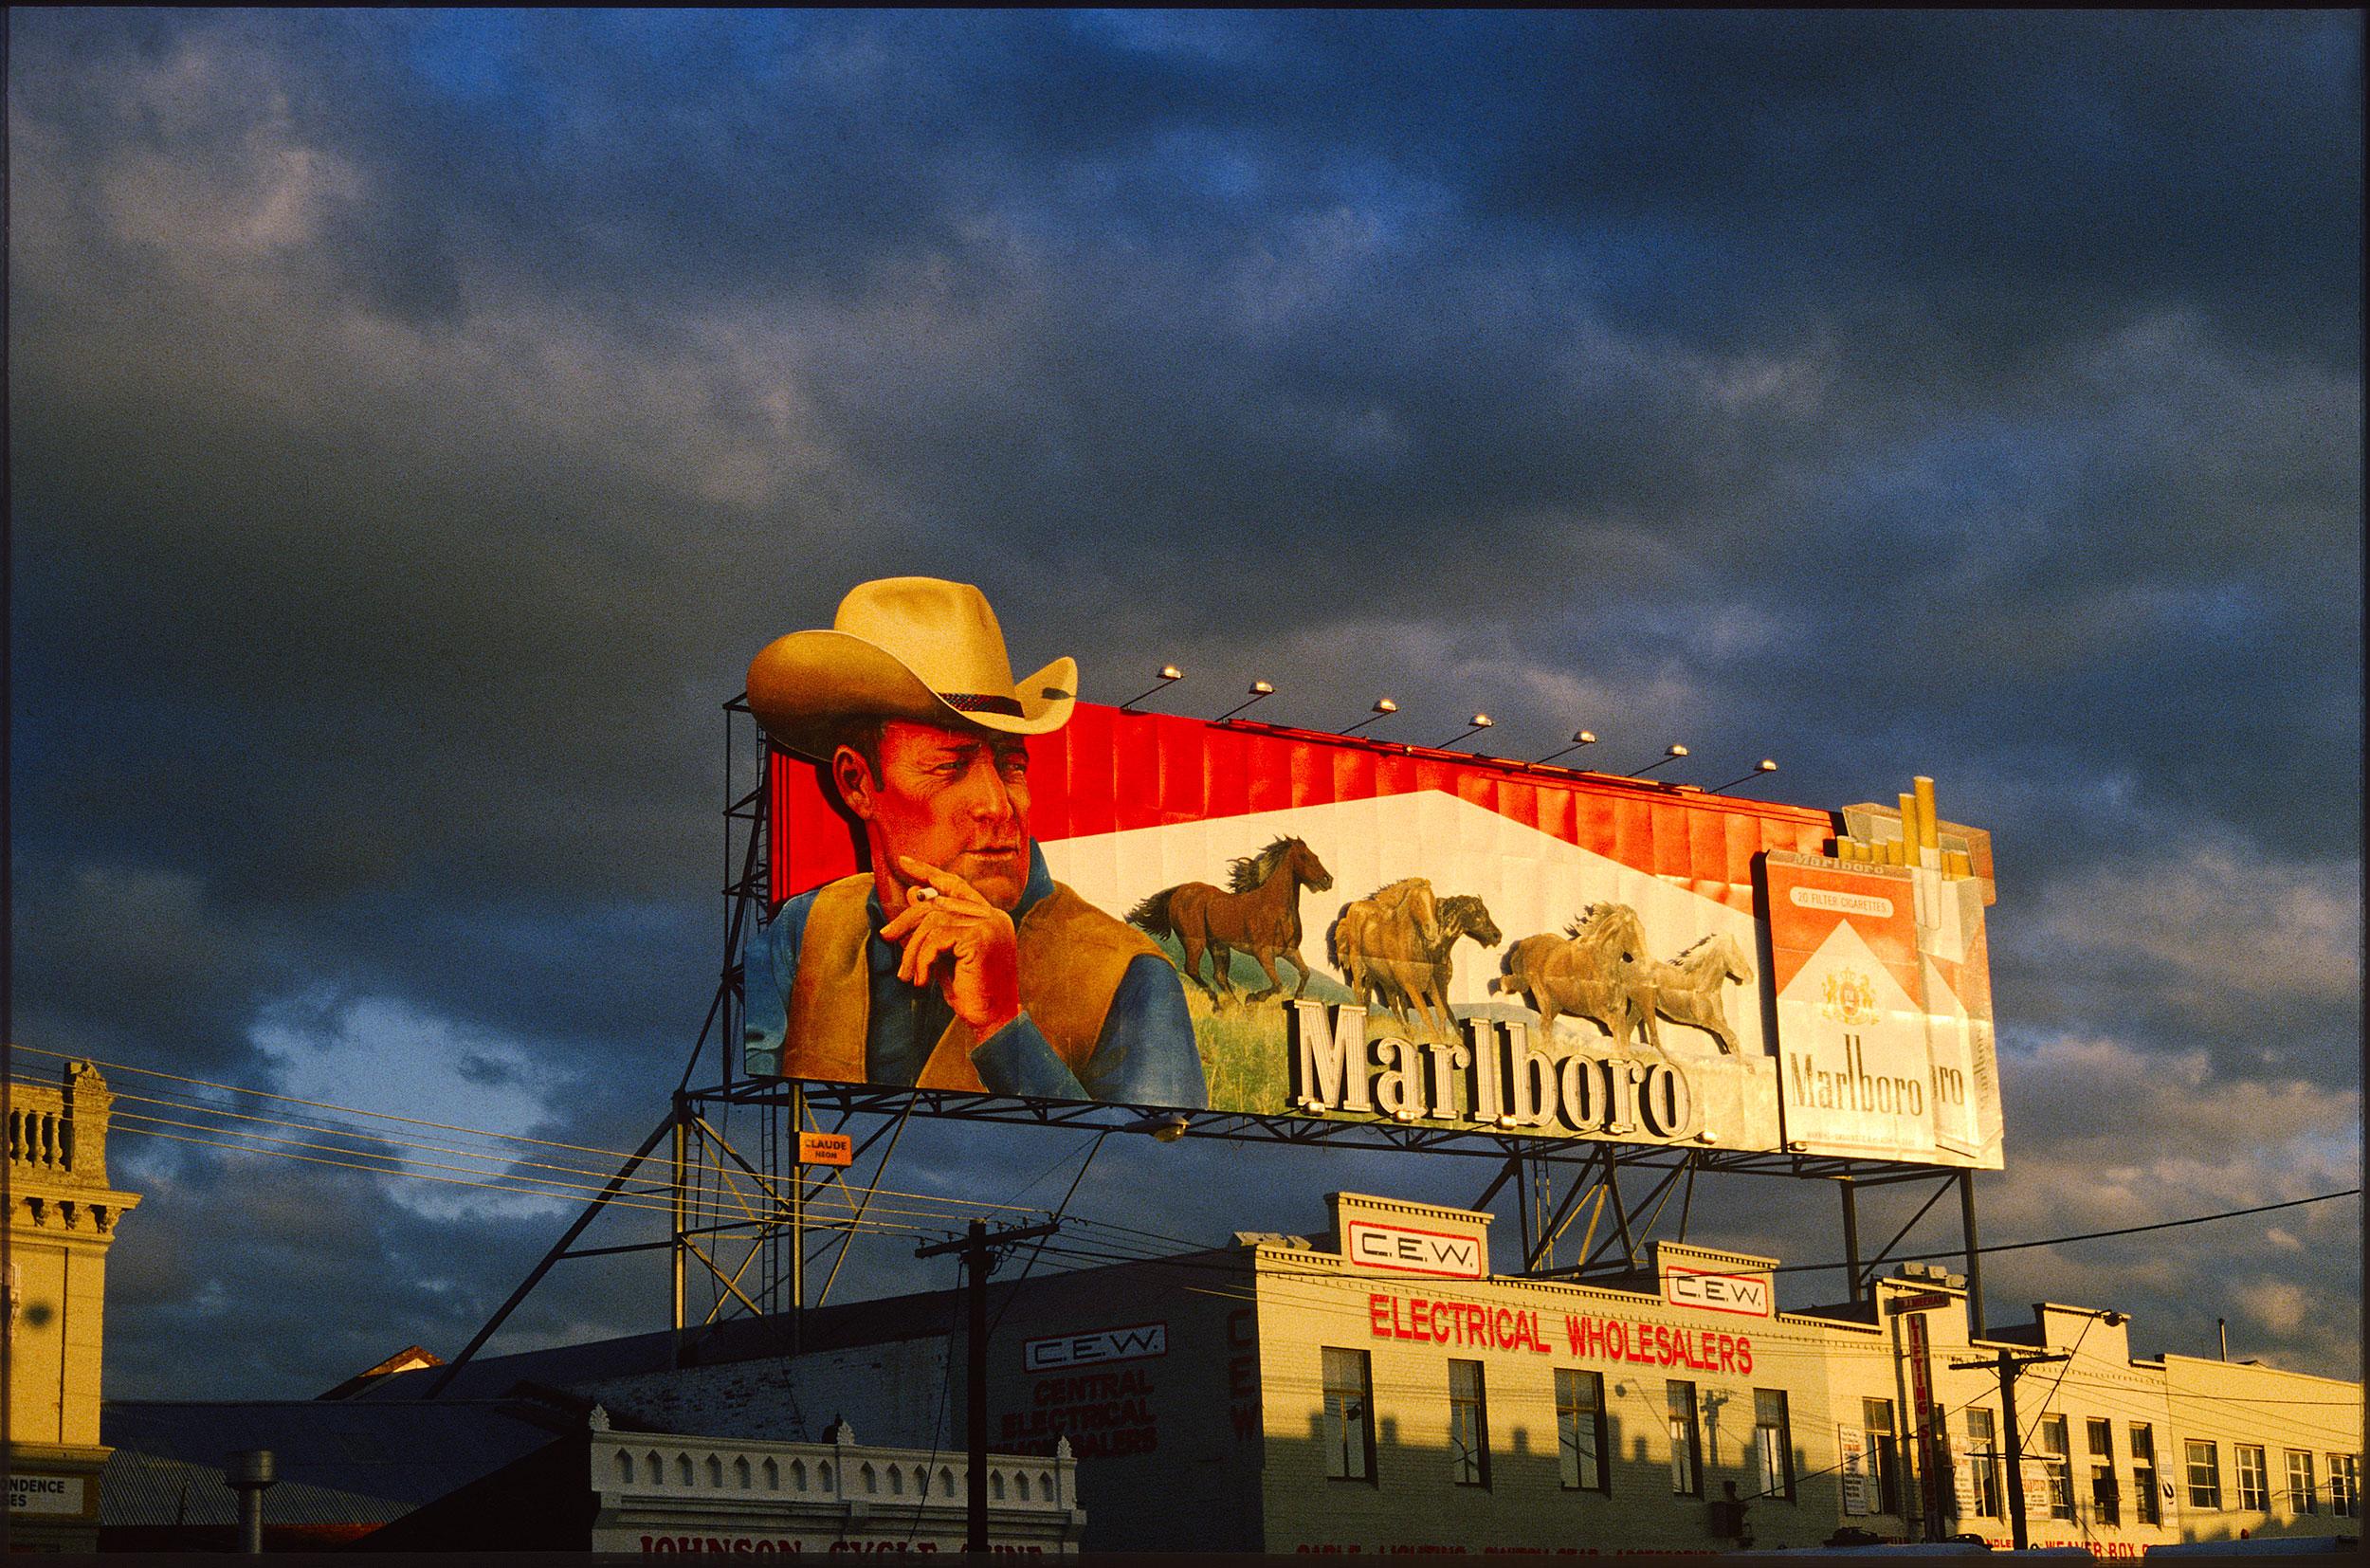 south melbourne 1979